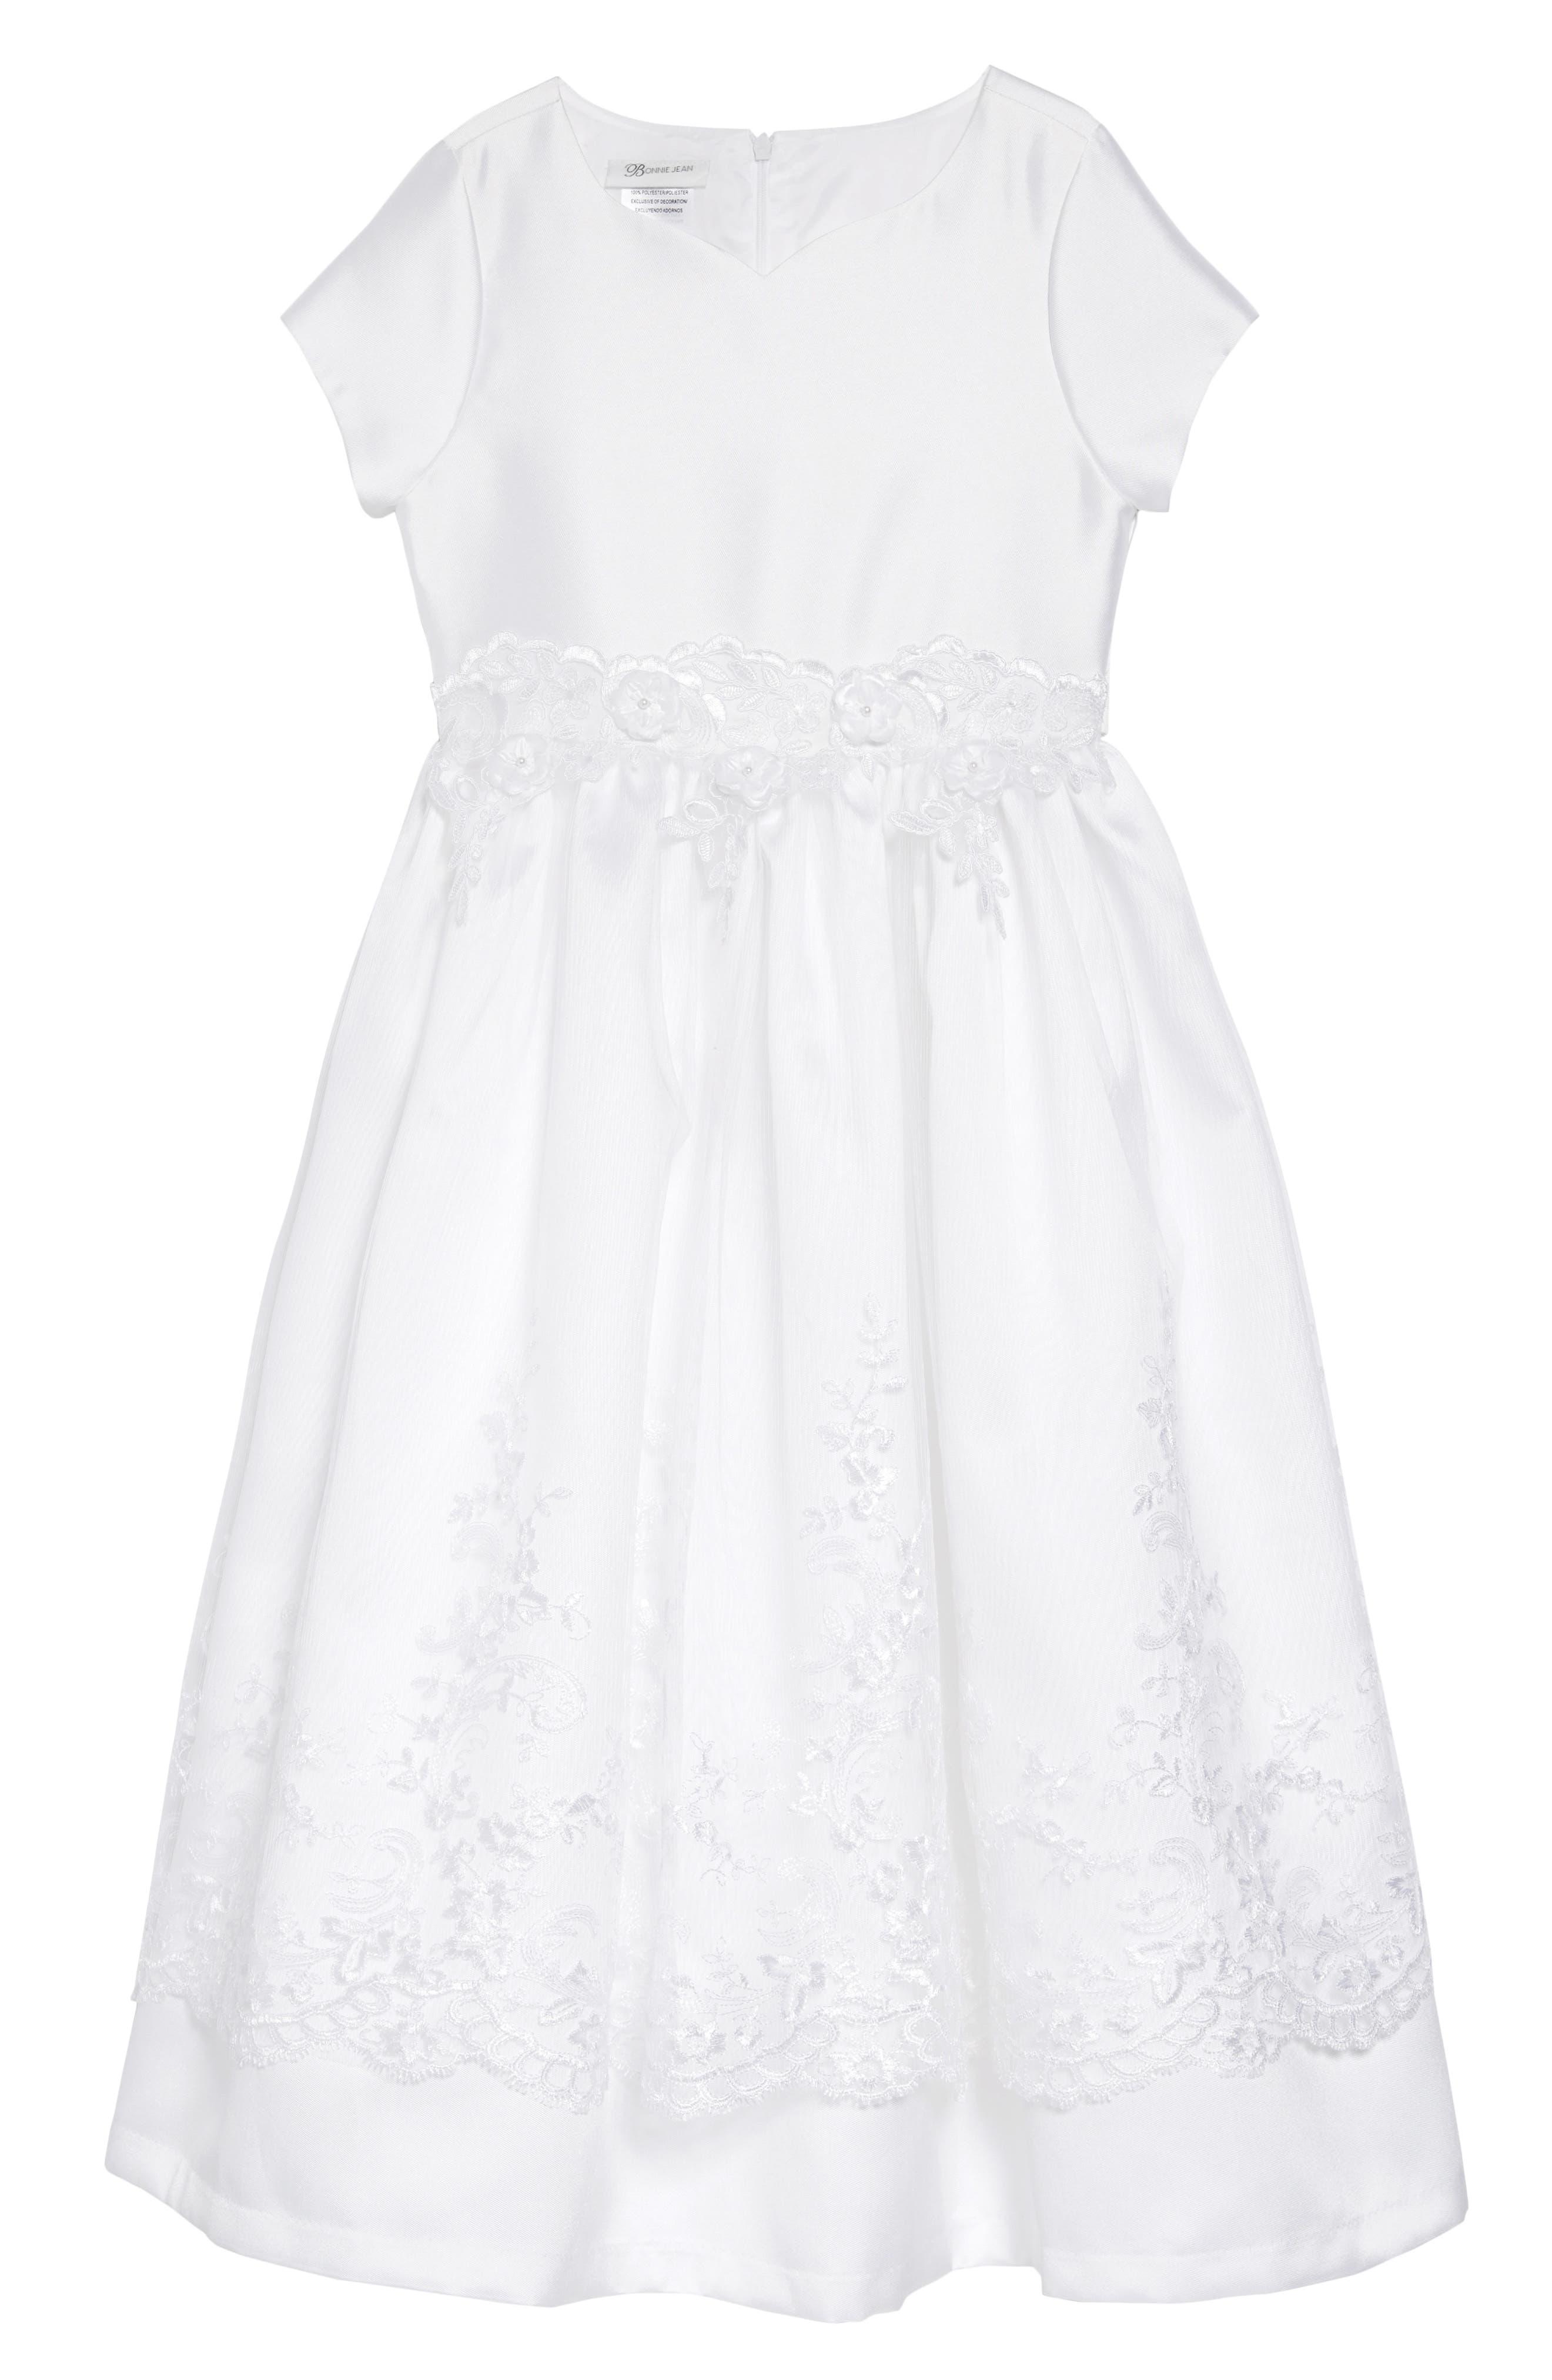 IRIS & IVY, Sweetheart Mikado Dress, Main thumbnail 1, color, WHITE